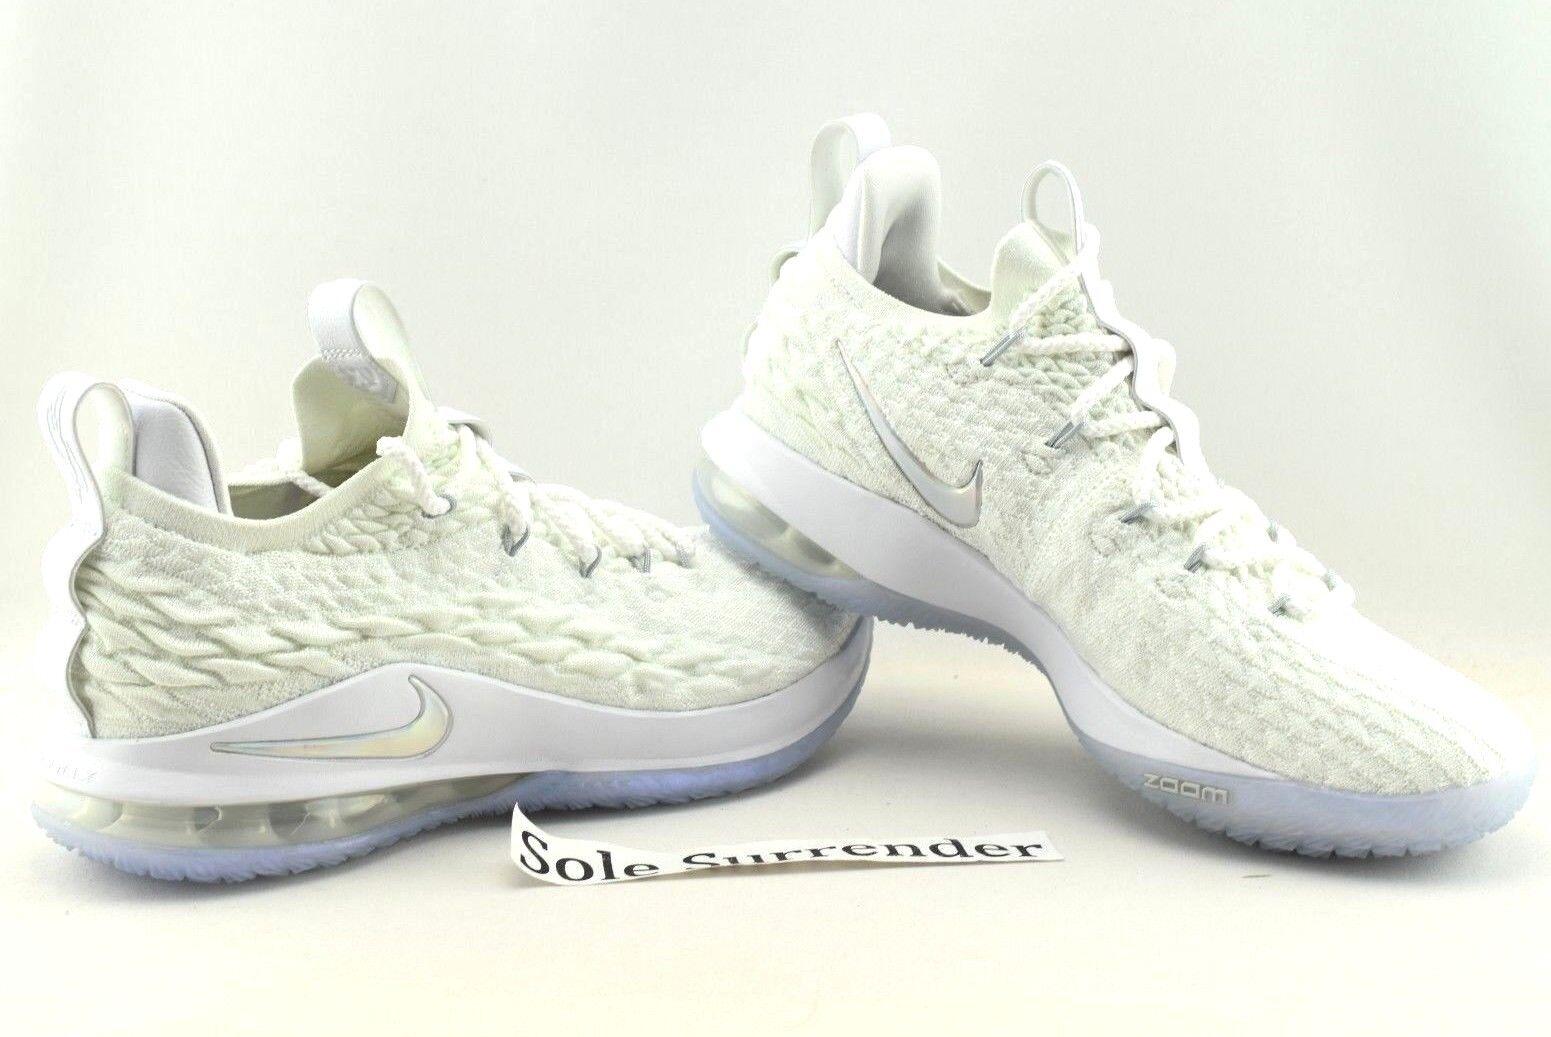 Nike Lebron XV Low - CHOOSE SIZE - AO1755-100 Triple Whiteout Silver 15 James Wild casual shoes